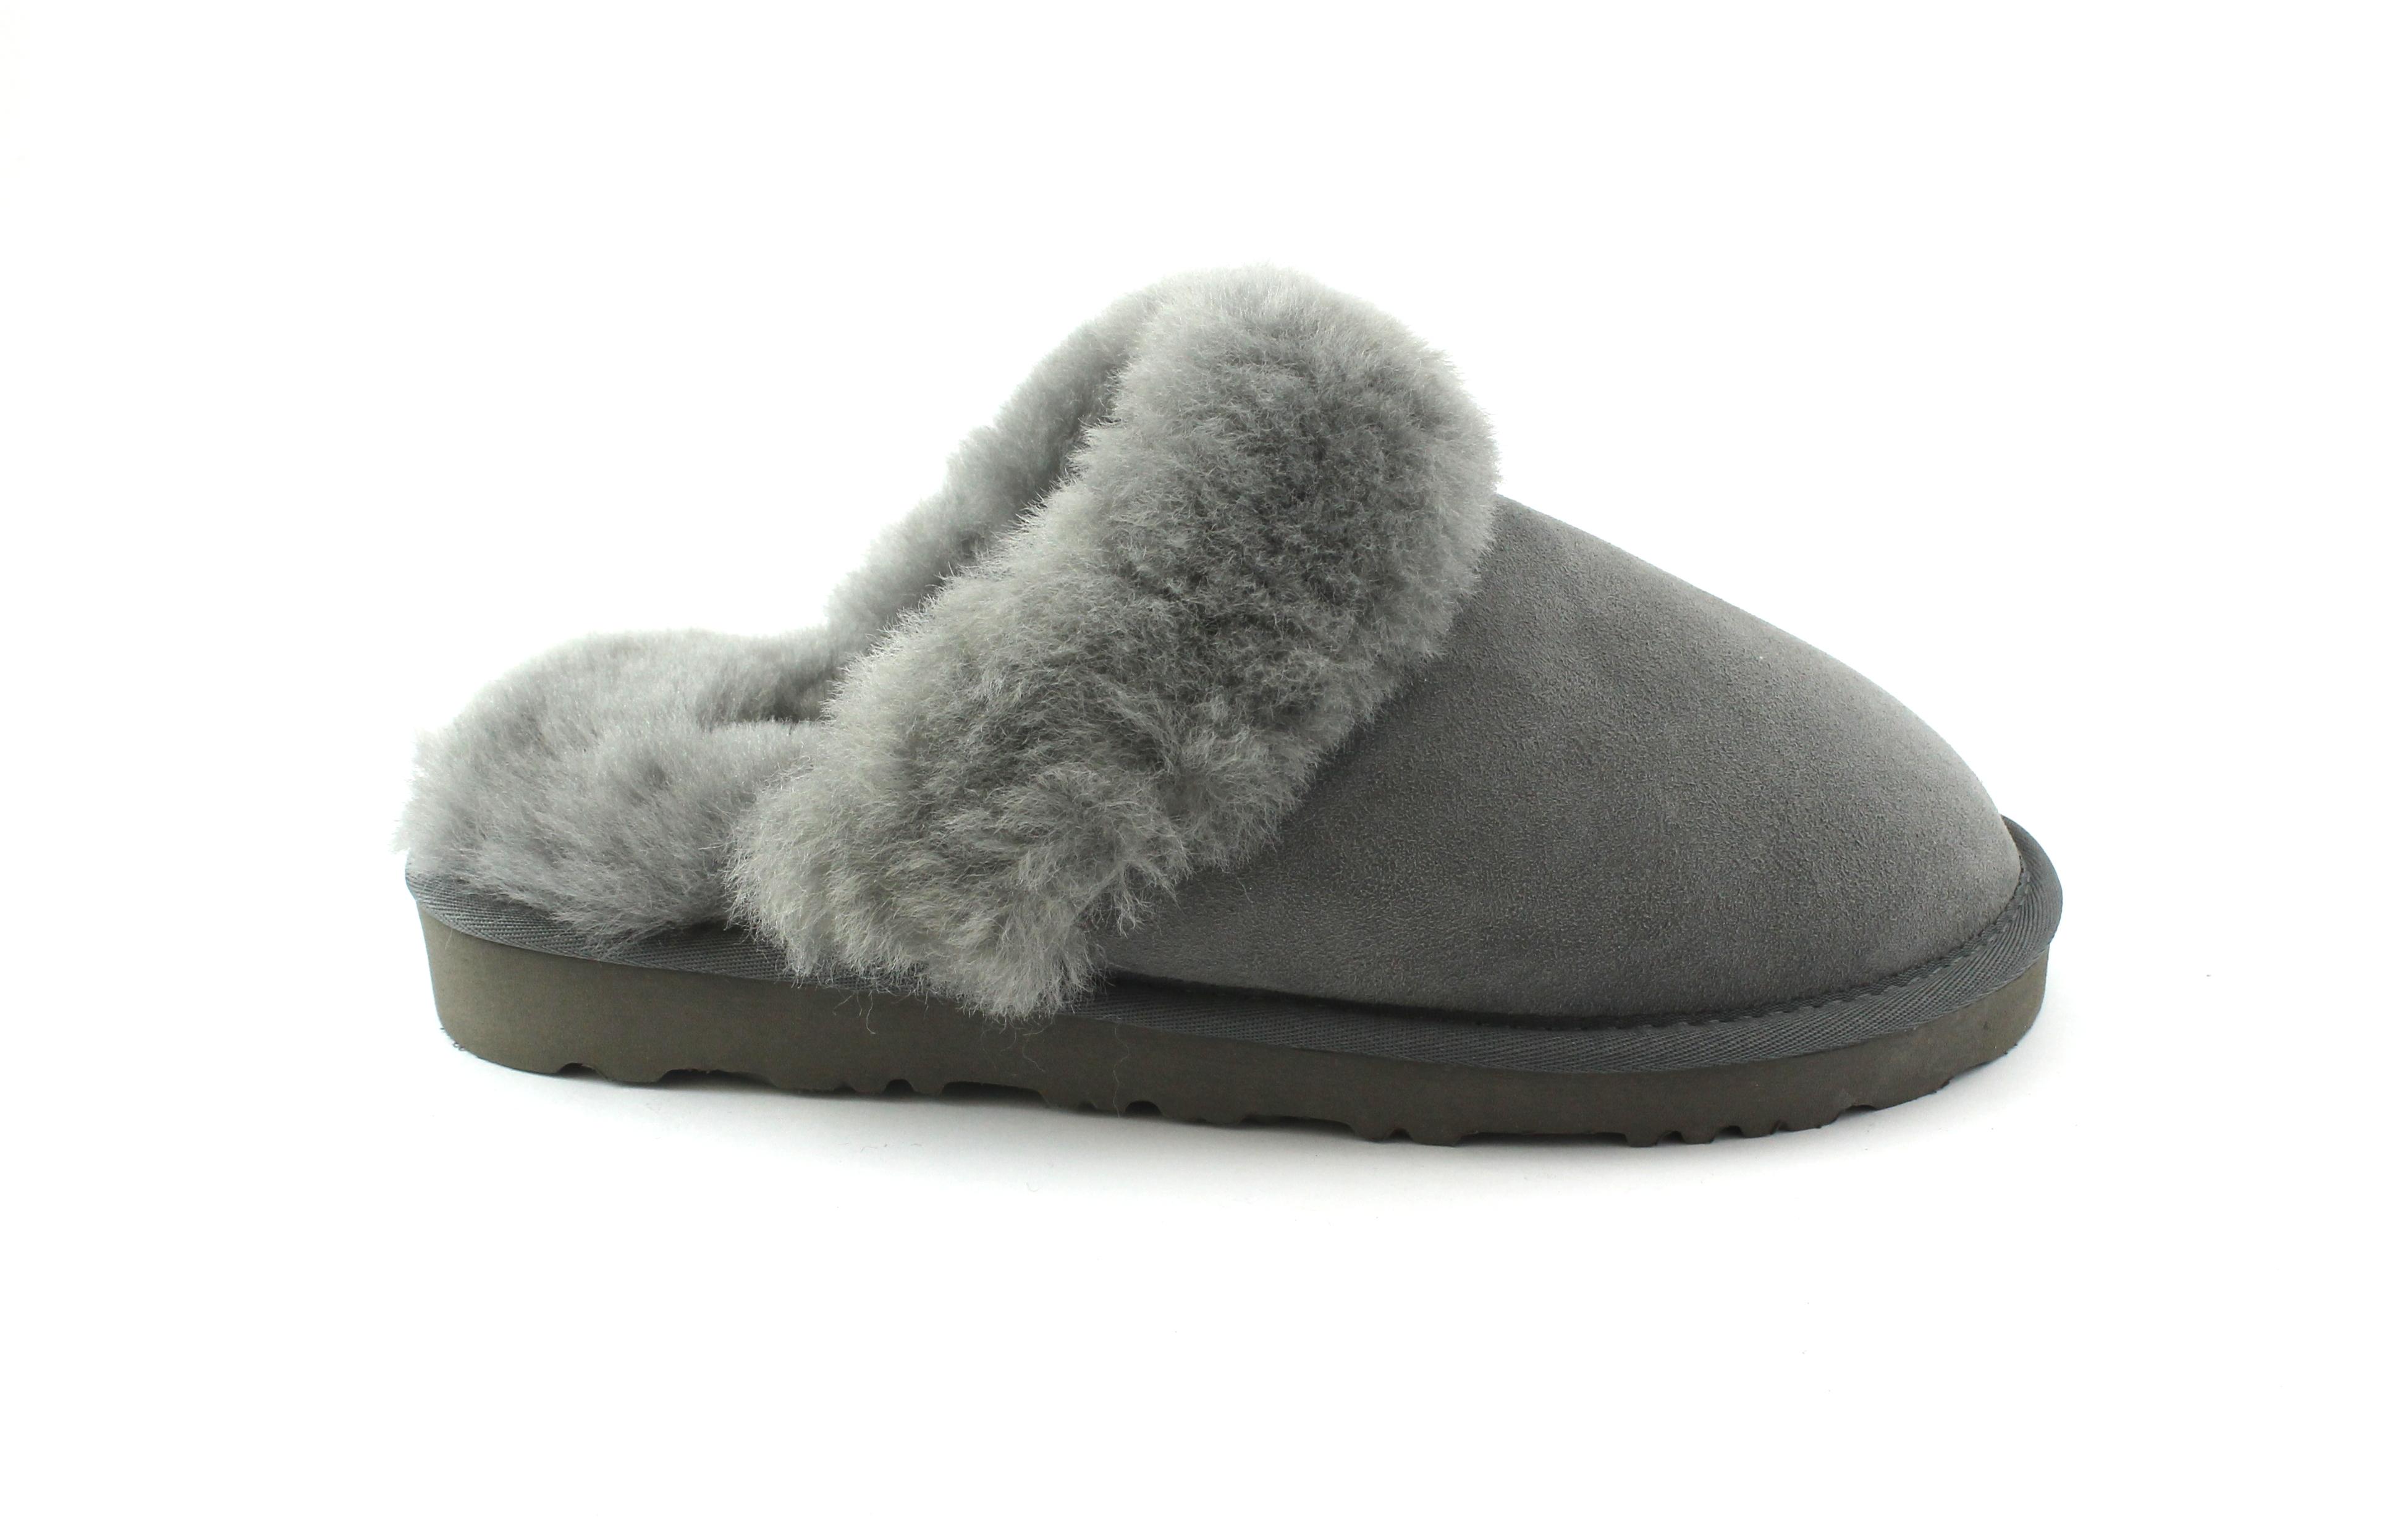 GRUNLAND CHON CI1740 grigio ciabatte montone pantofole donna vero montone ciabatte 8ced45